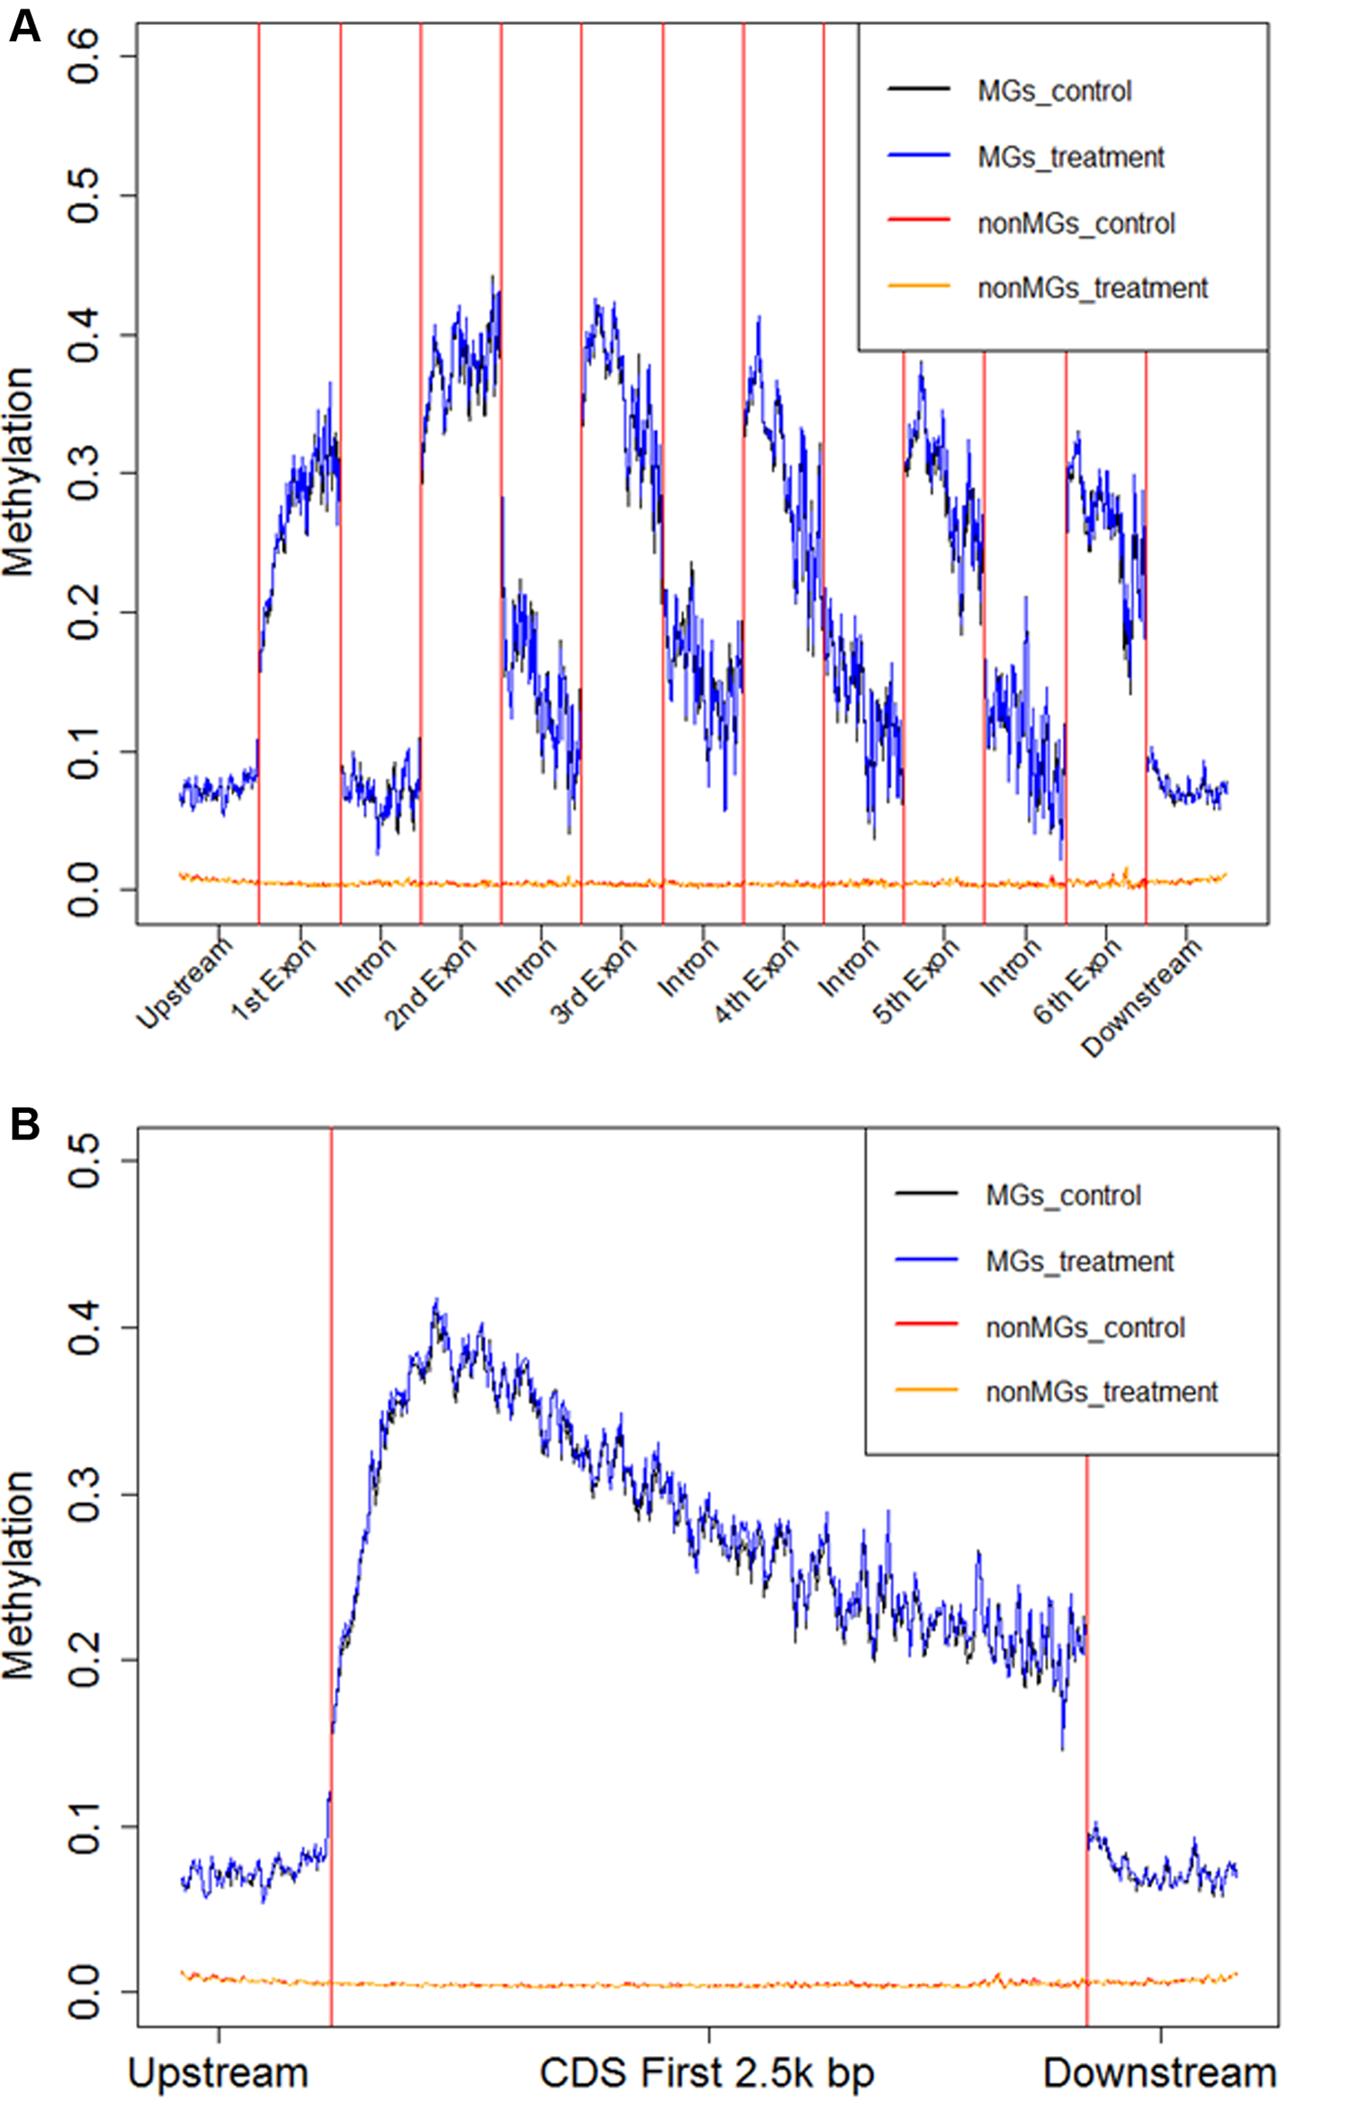 Average fractional methylation levels in different gene regions.